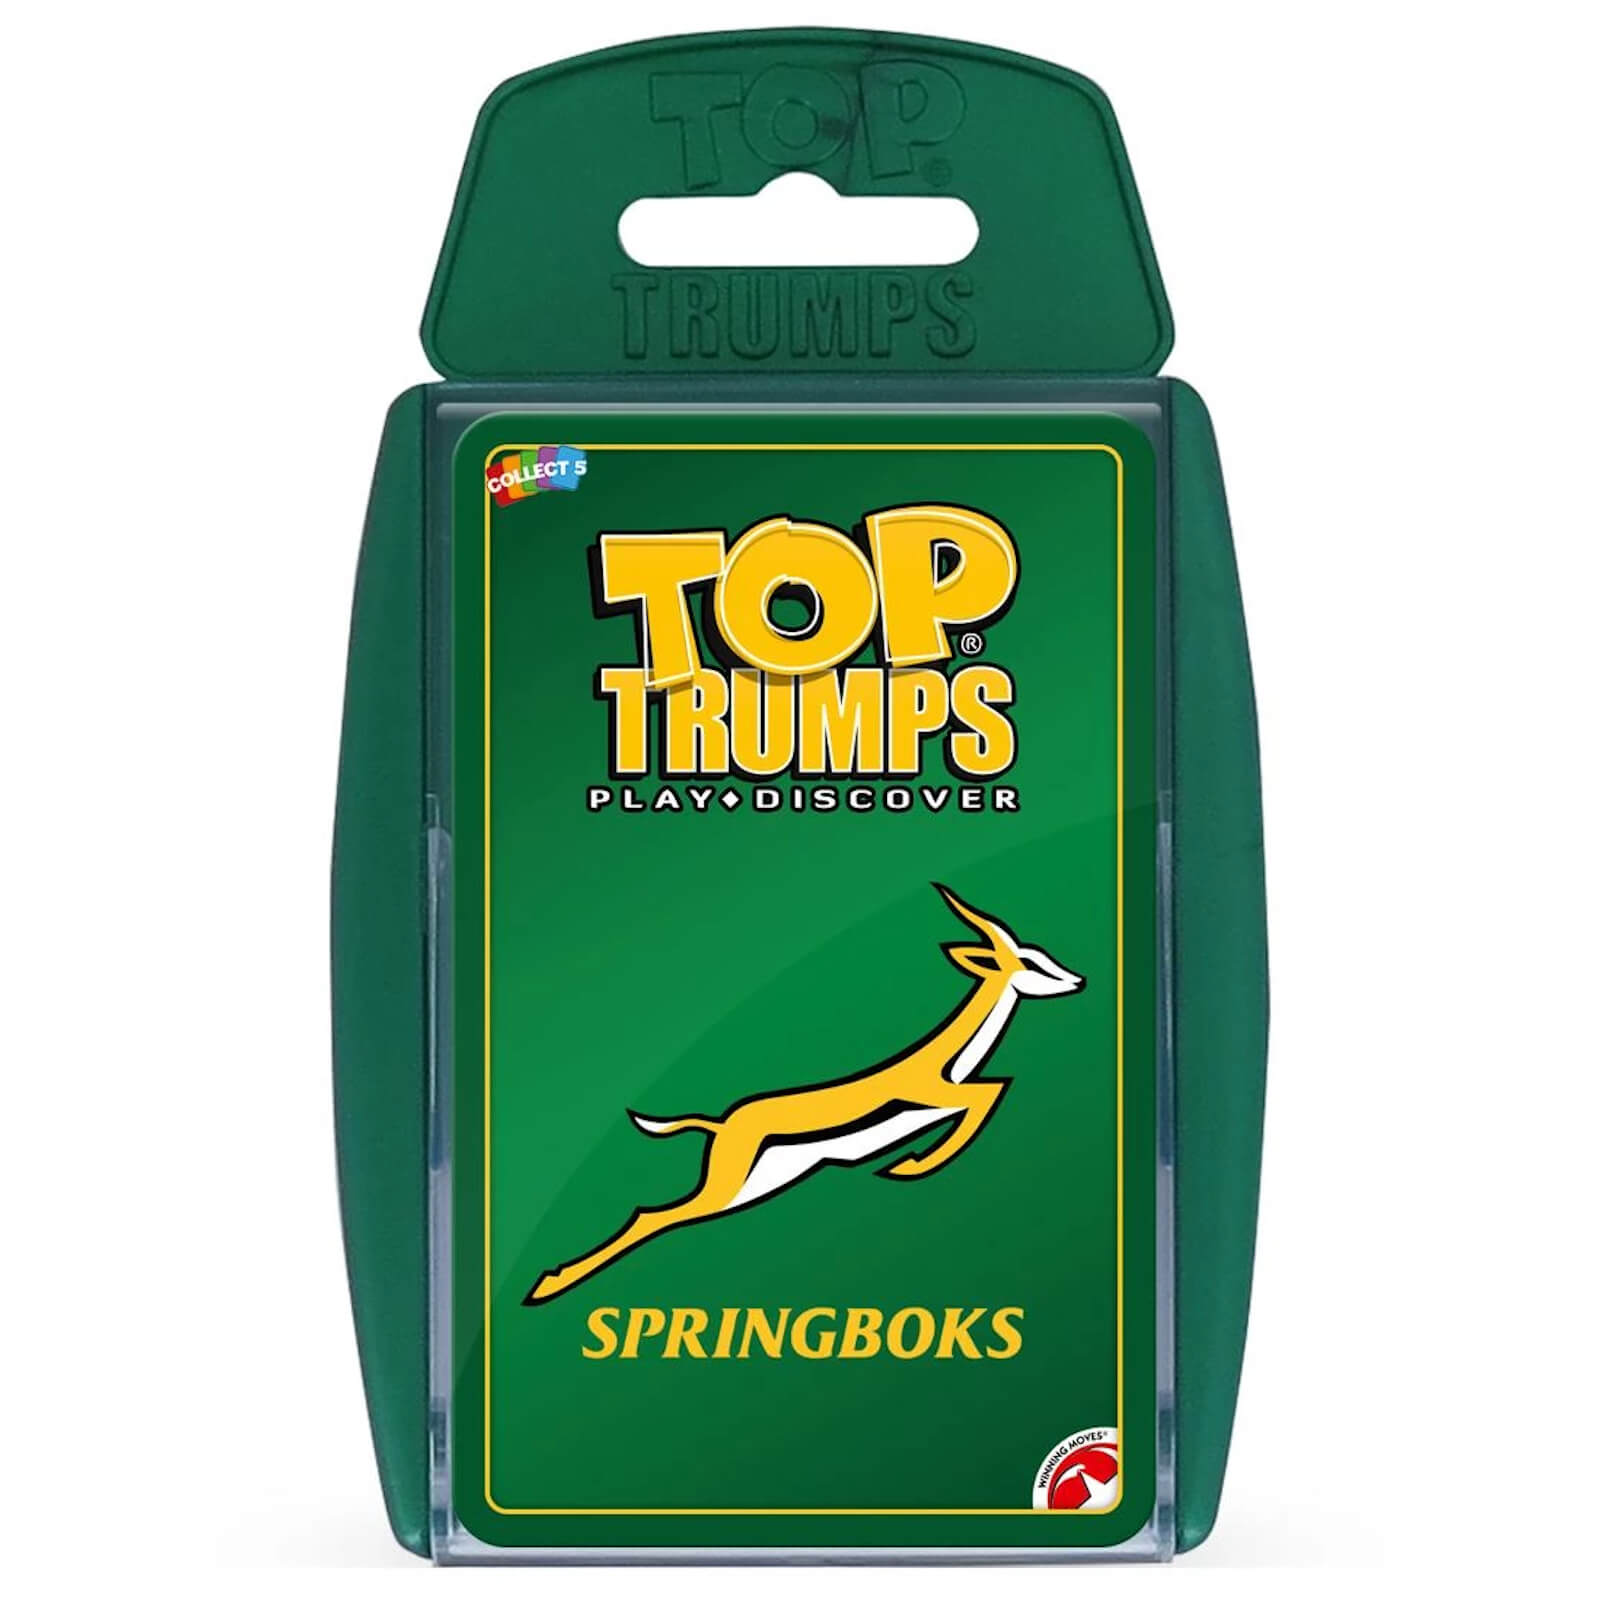 Image of Top Trumps Card Game - Springbok Edition